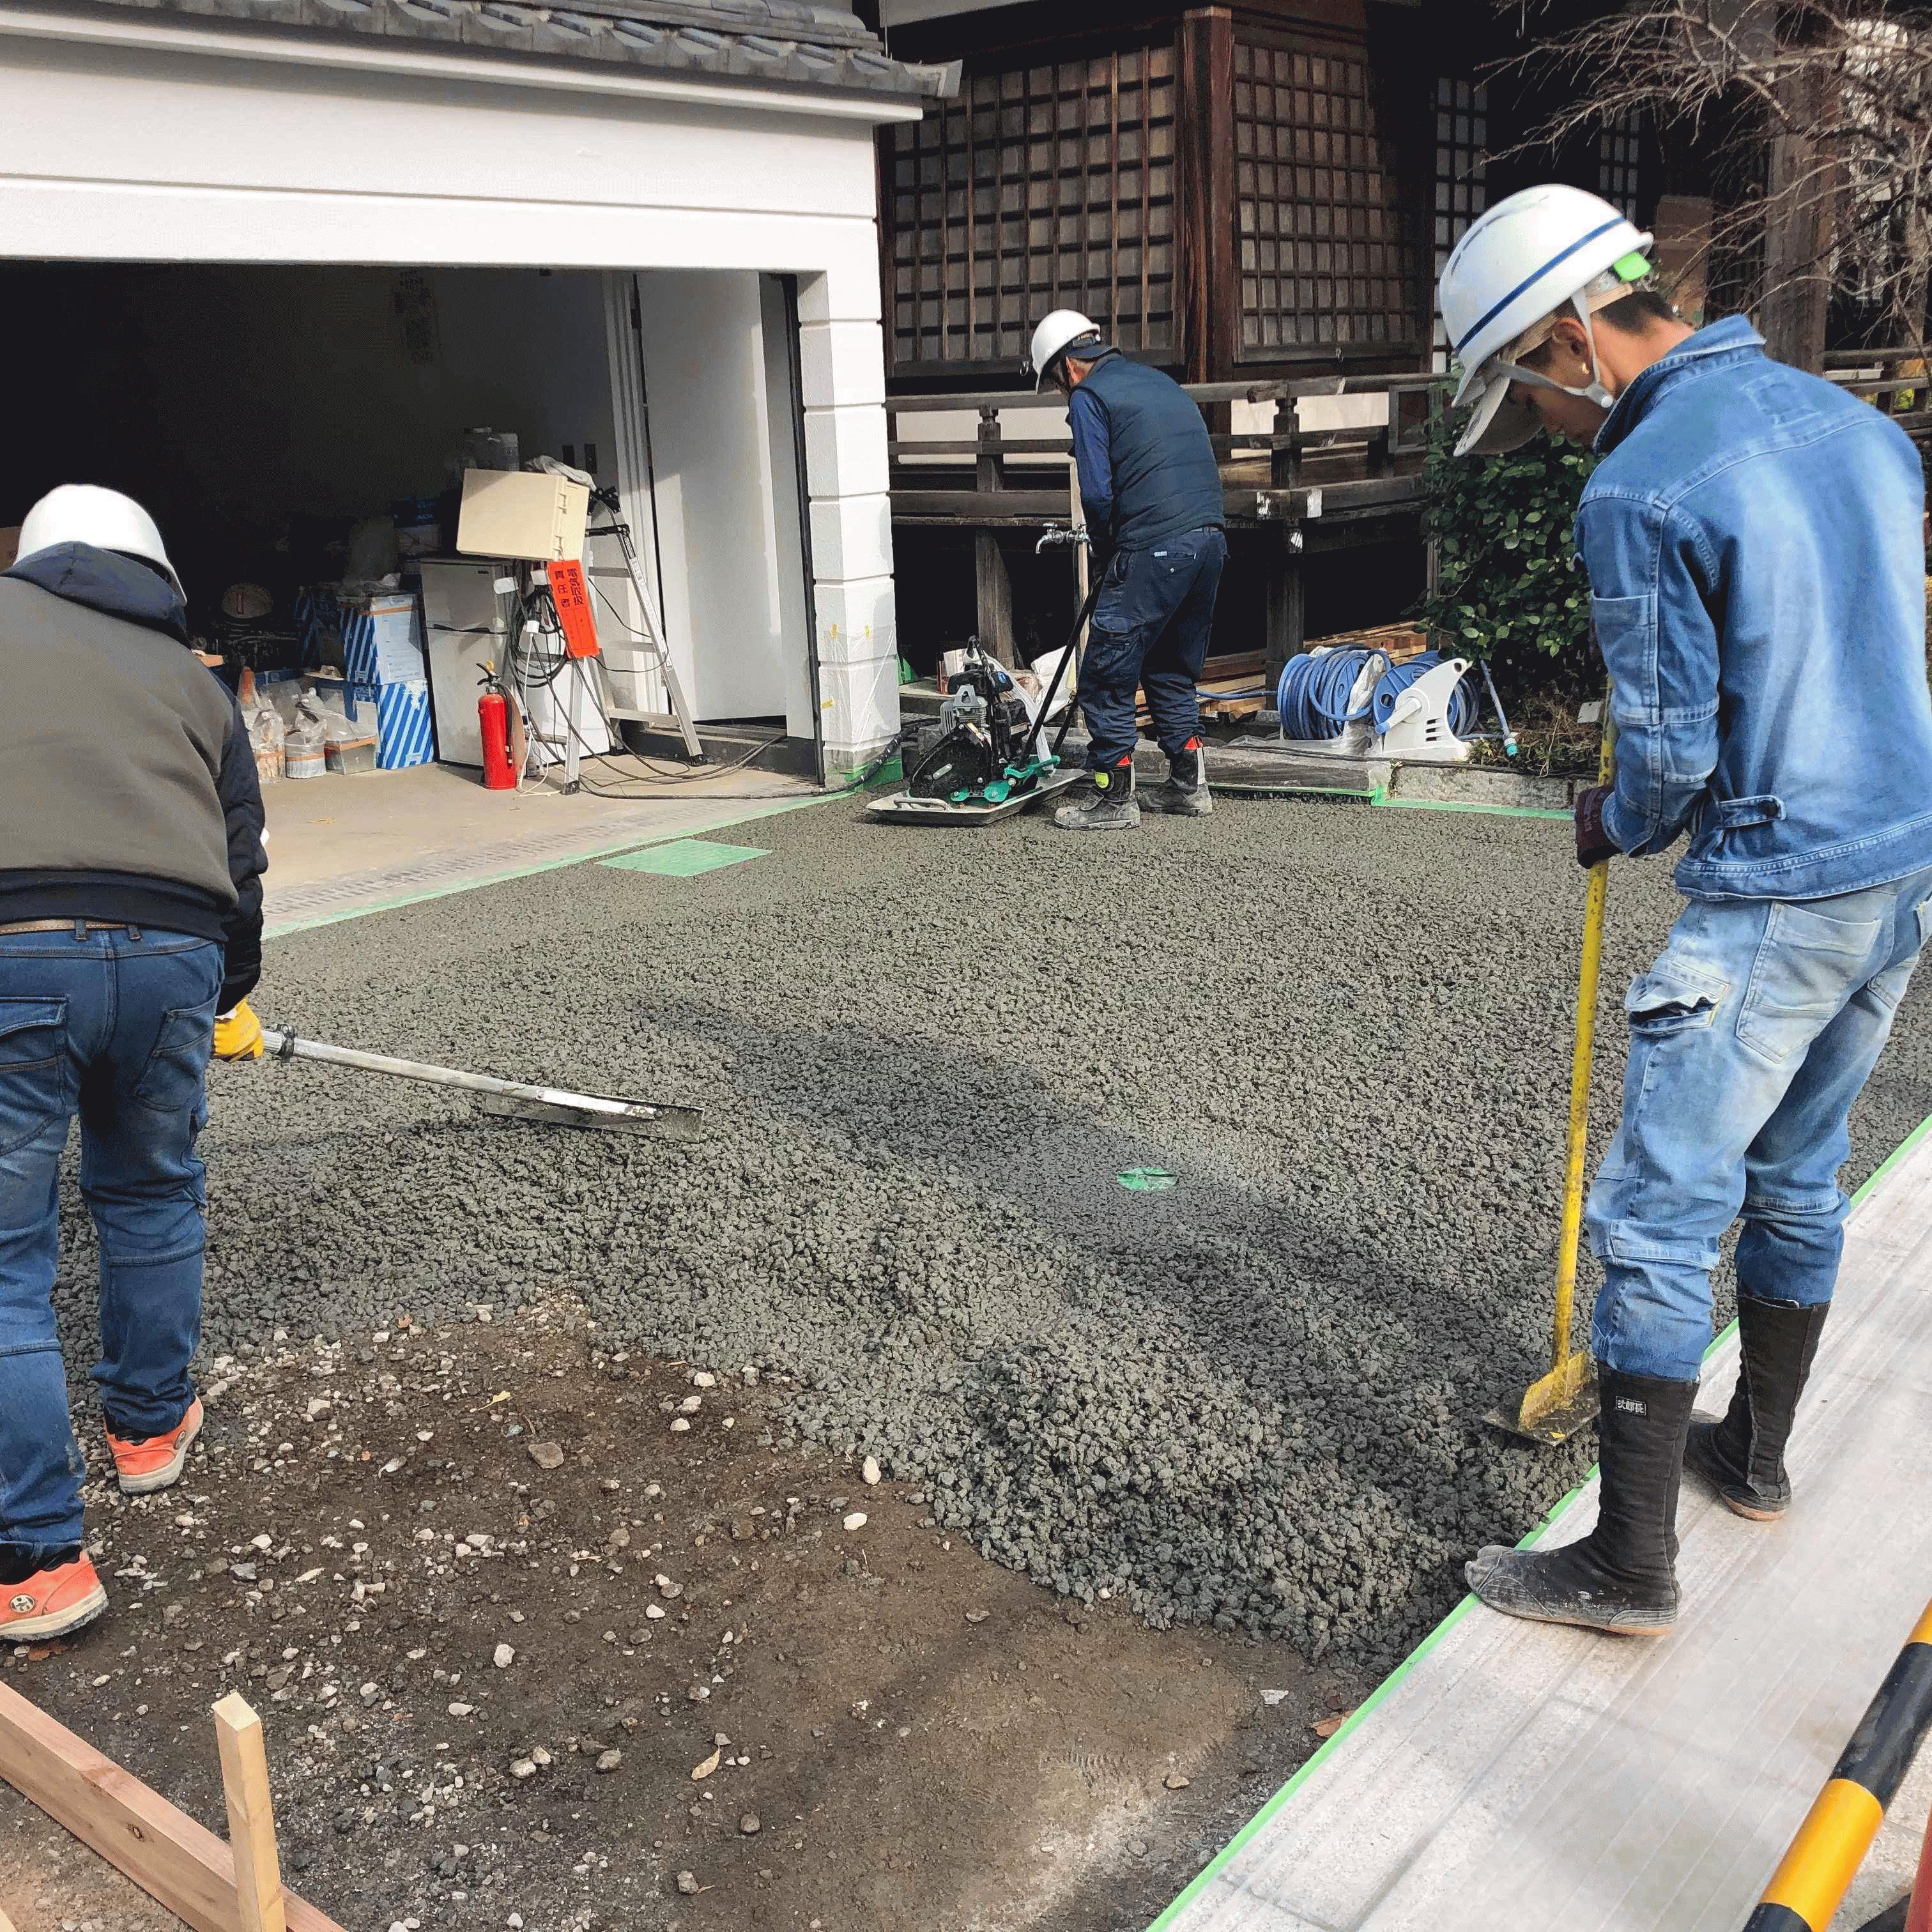 「DIY指導員が透水性コンクリート施工をサポートします」土間コン